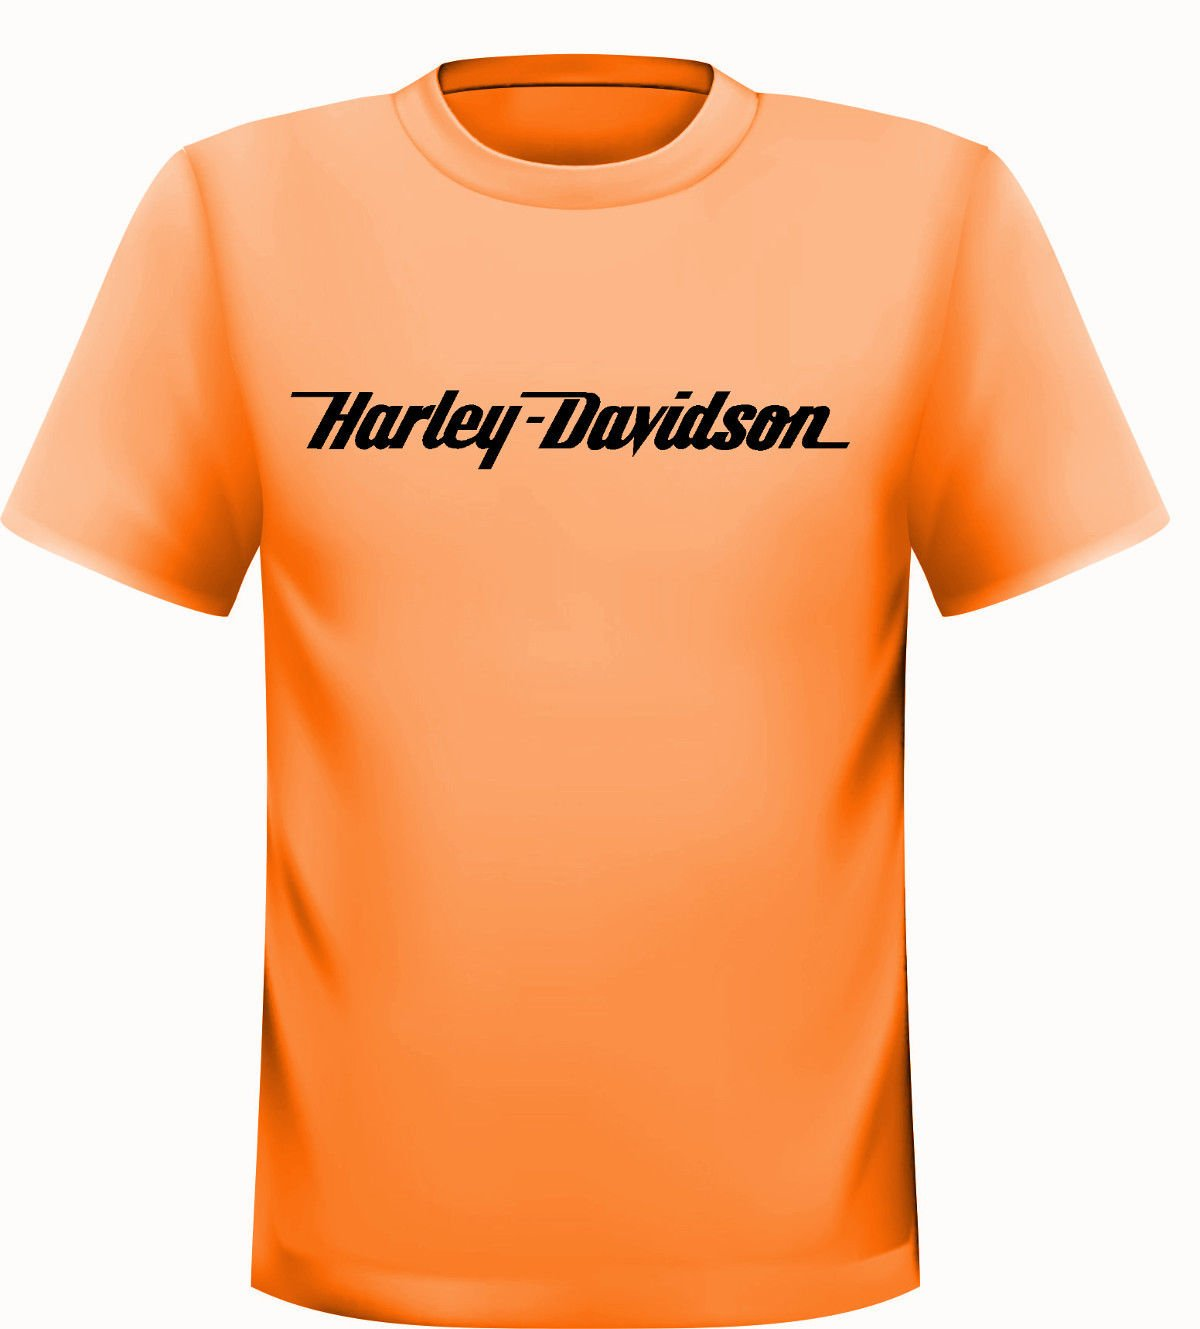 Harley Davidson Camiseta de naranja Streetwall